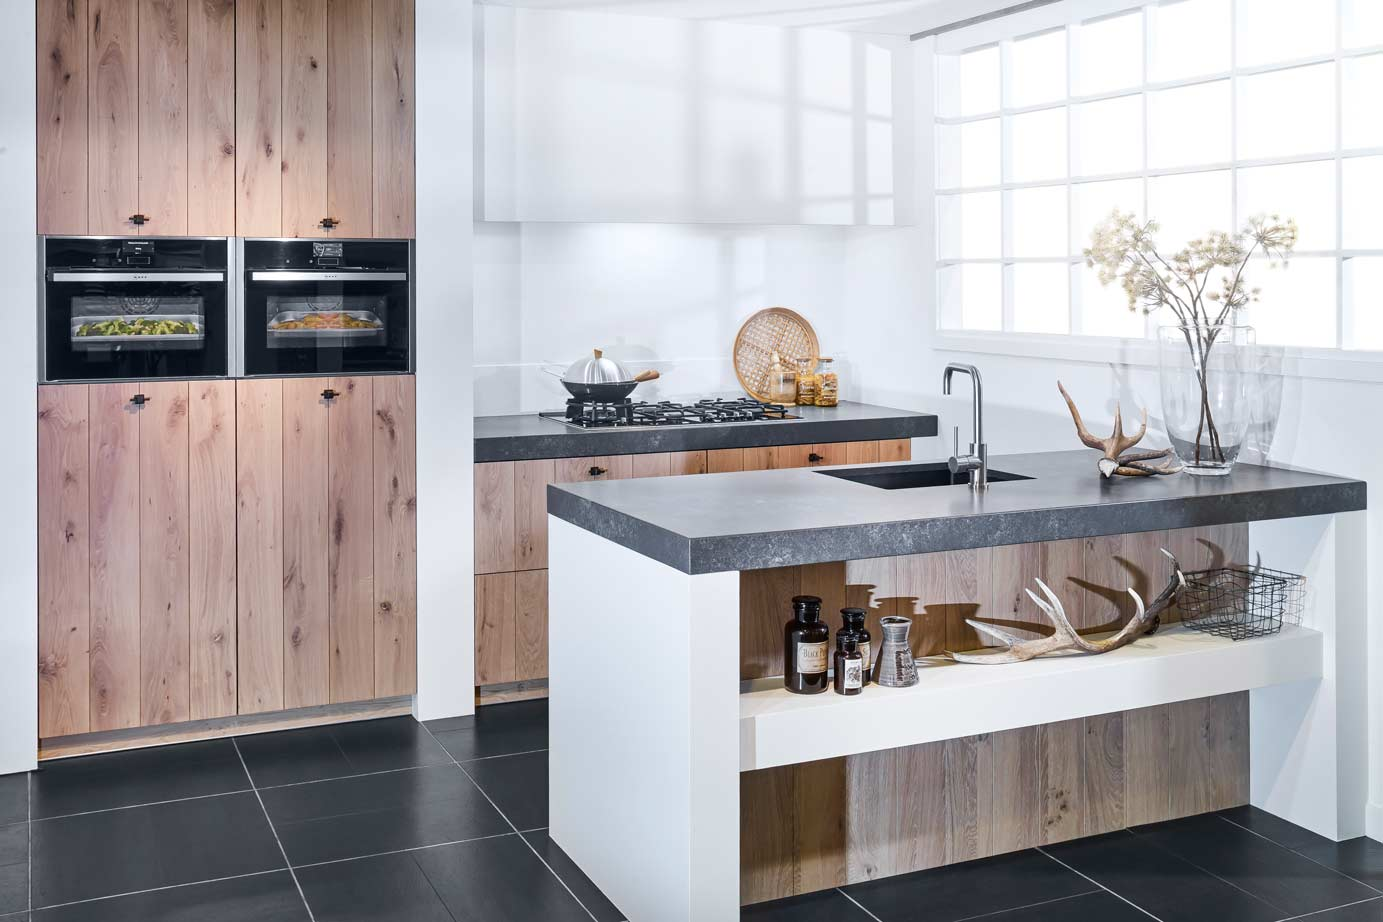 Kleine Keuken Kopen : Klein kookeiland gallery of kleine keuken met kookeiland beste